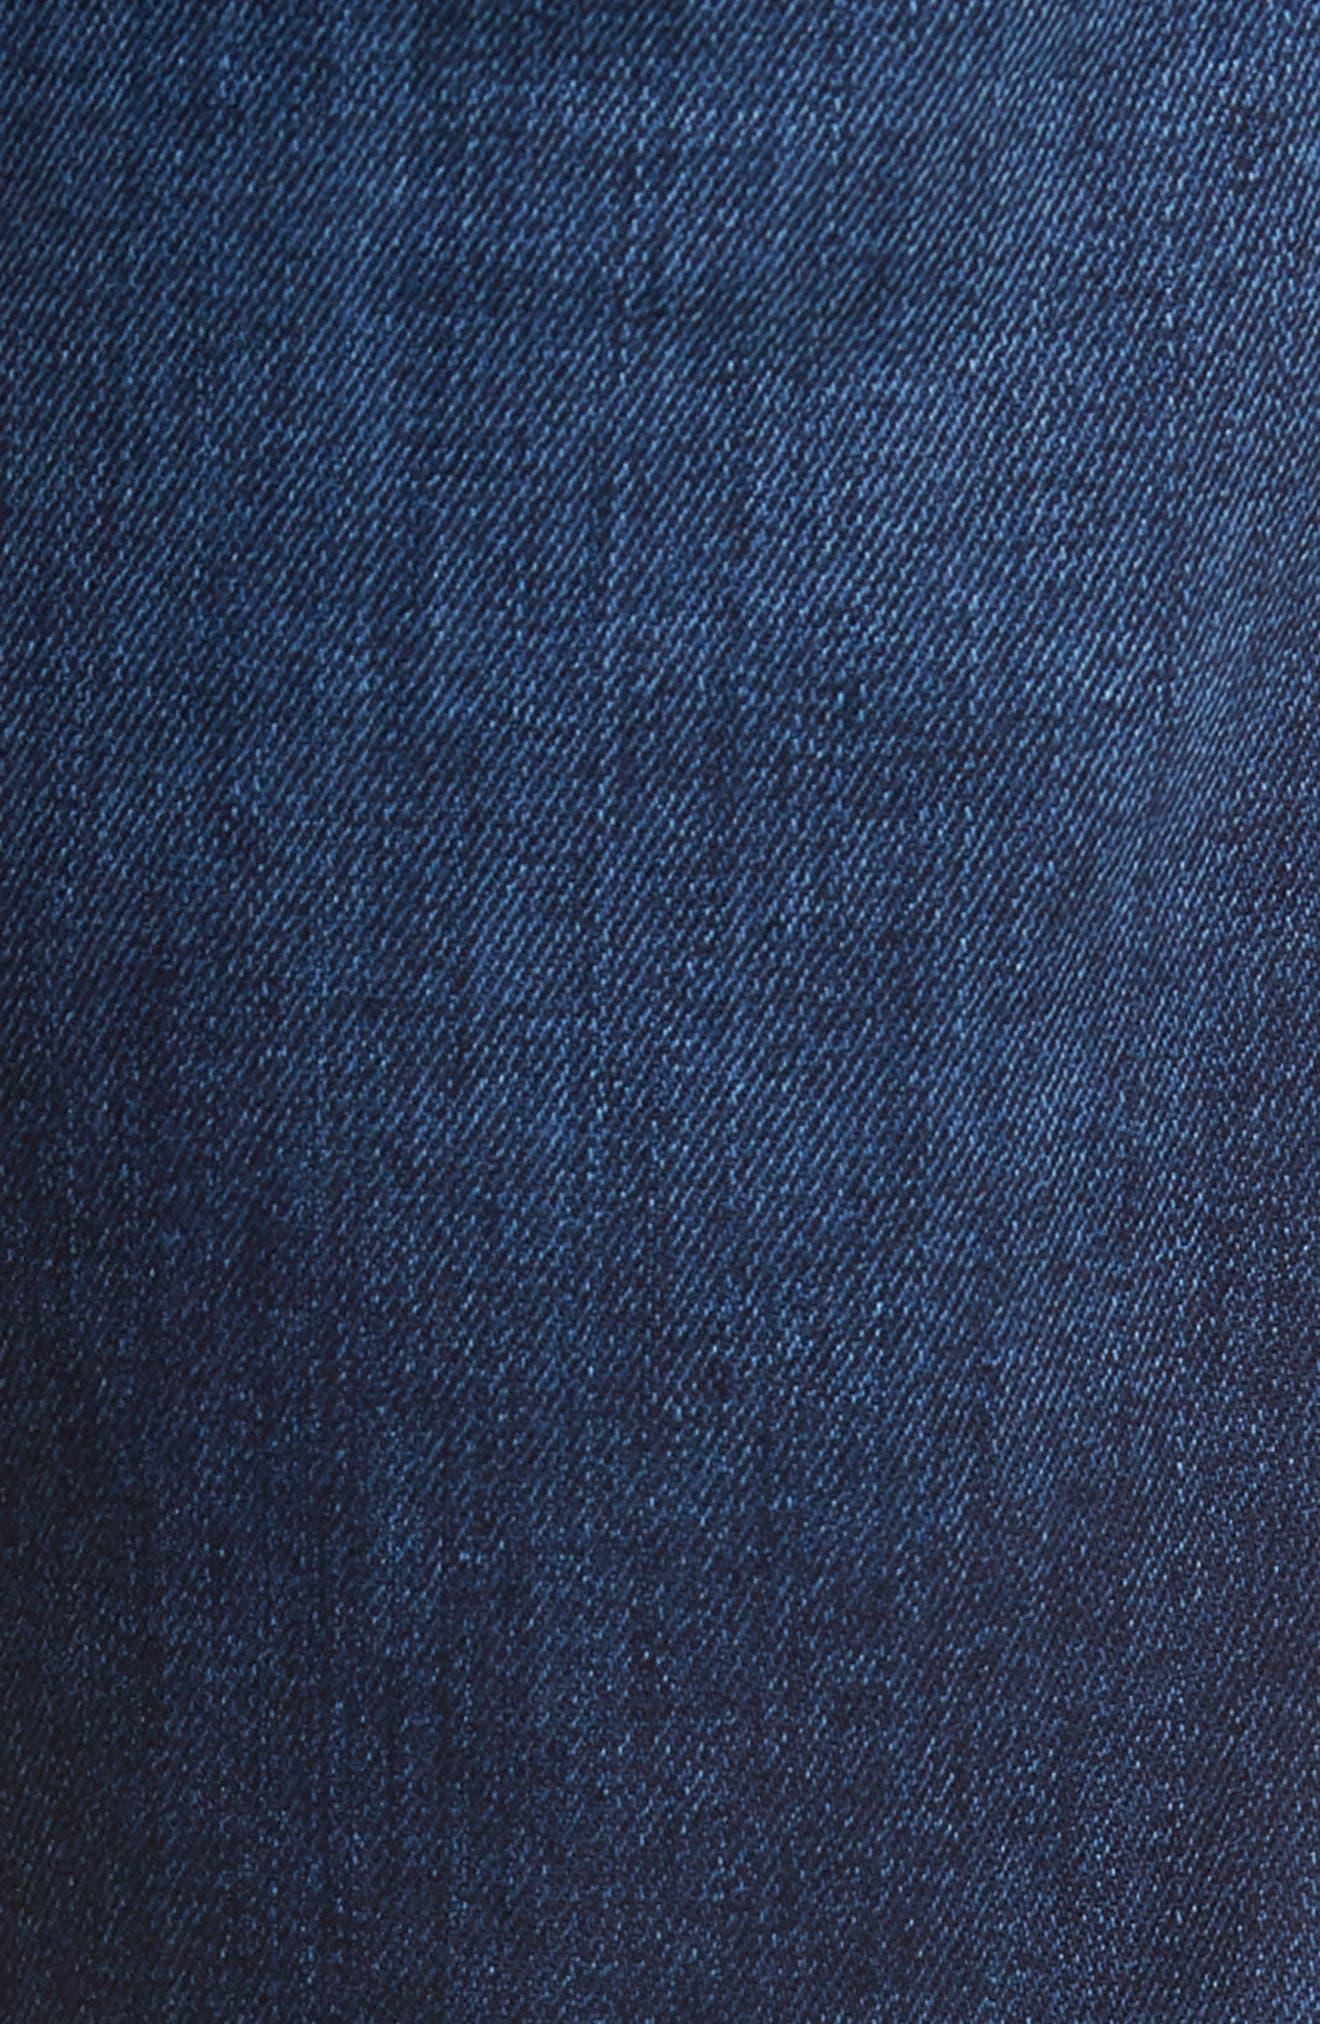 708 Stretch Slim Fit Jeans,                             Alternate thumbnail 5, color,                             420